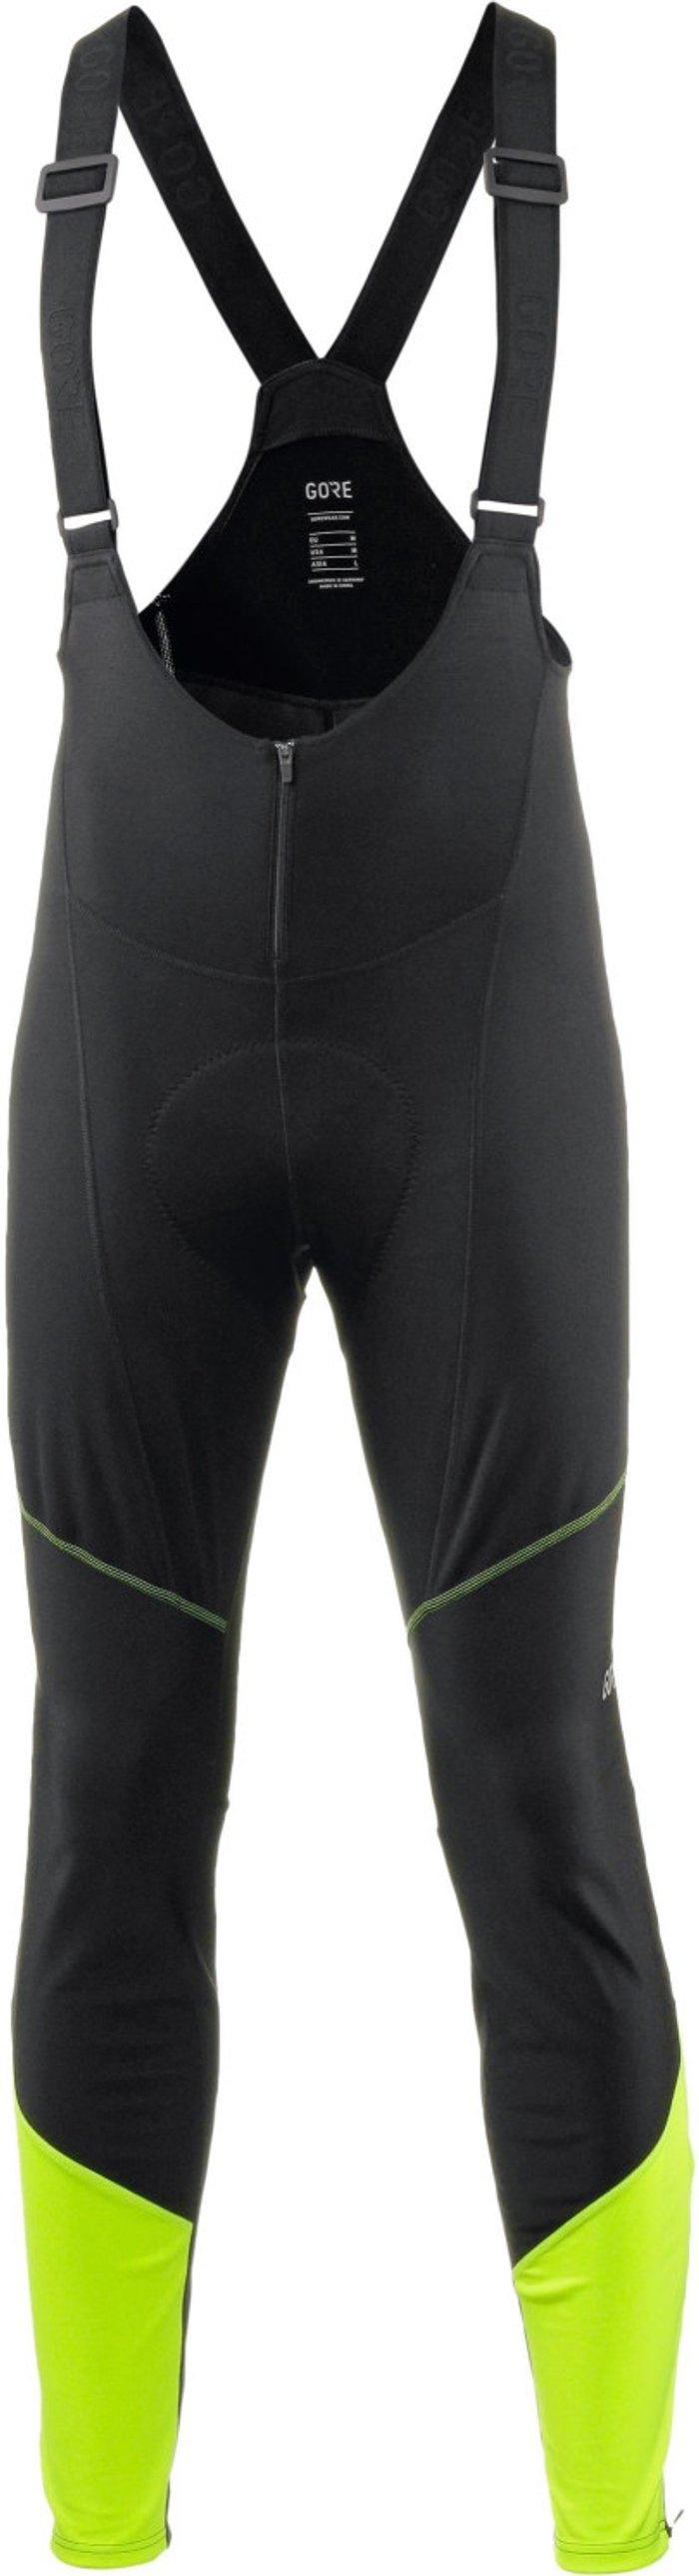 GORE Gore C3 Windstopper Thermo Bib Shorts Men black/neon yellow